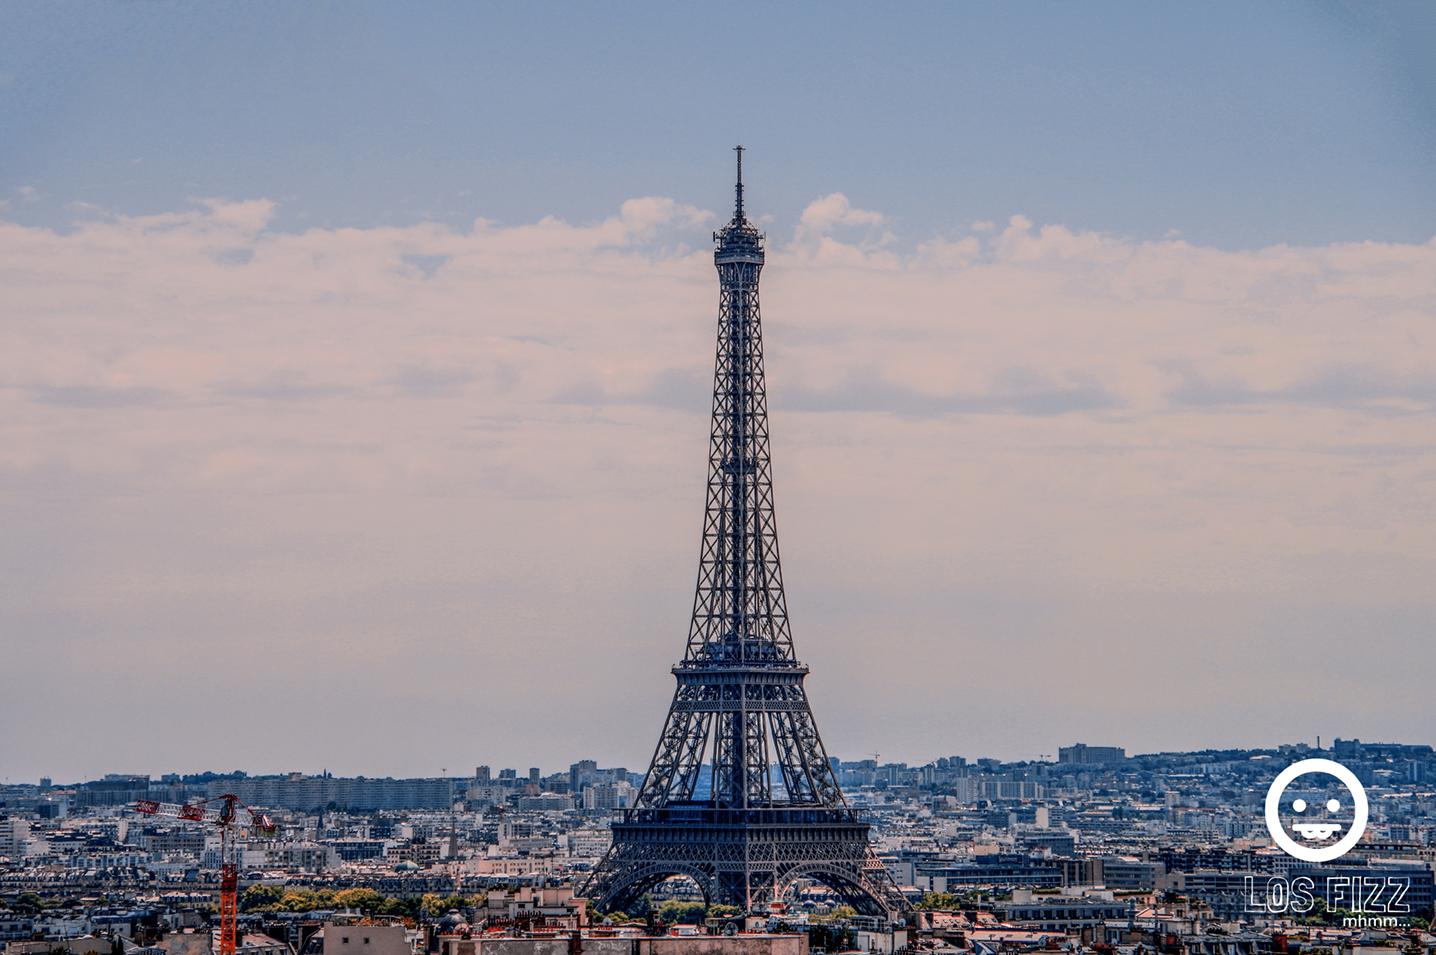 Eiffel Tower in Paris, France. Photo By LosFizz.